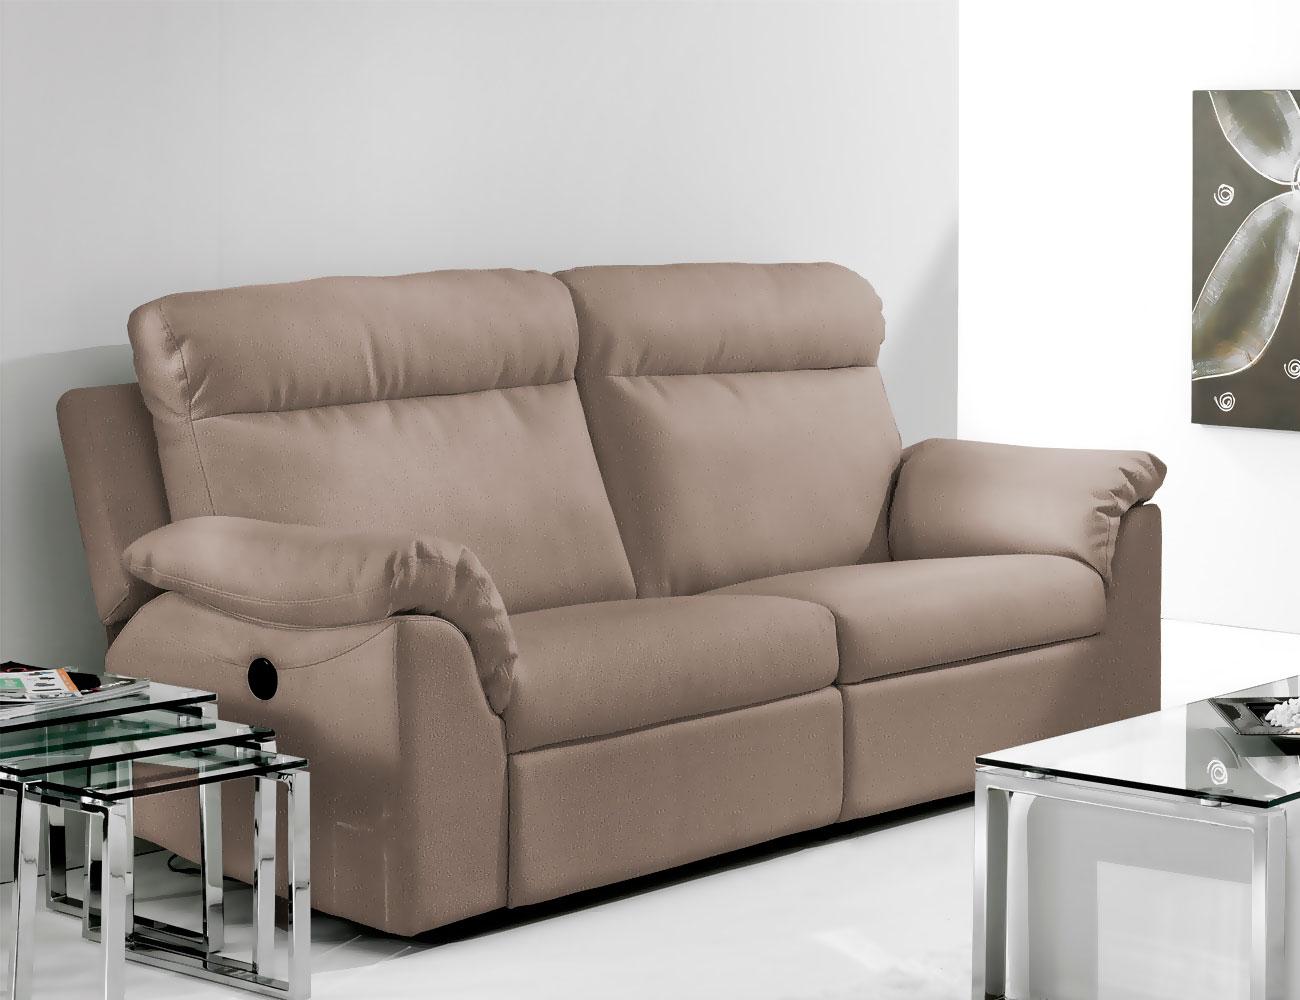 Sof de 3 plazas con dos asientos relax el ctricos en - Sofas de dos plazas ...